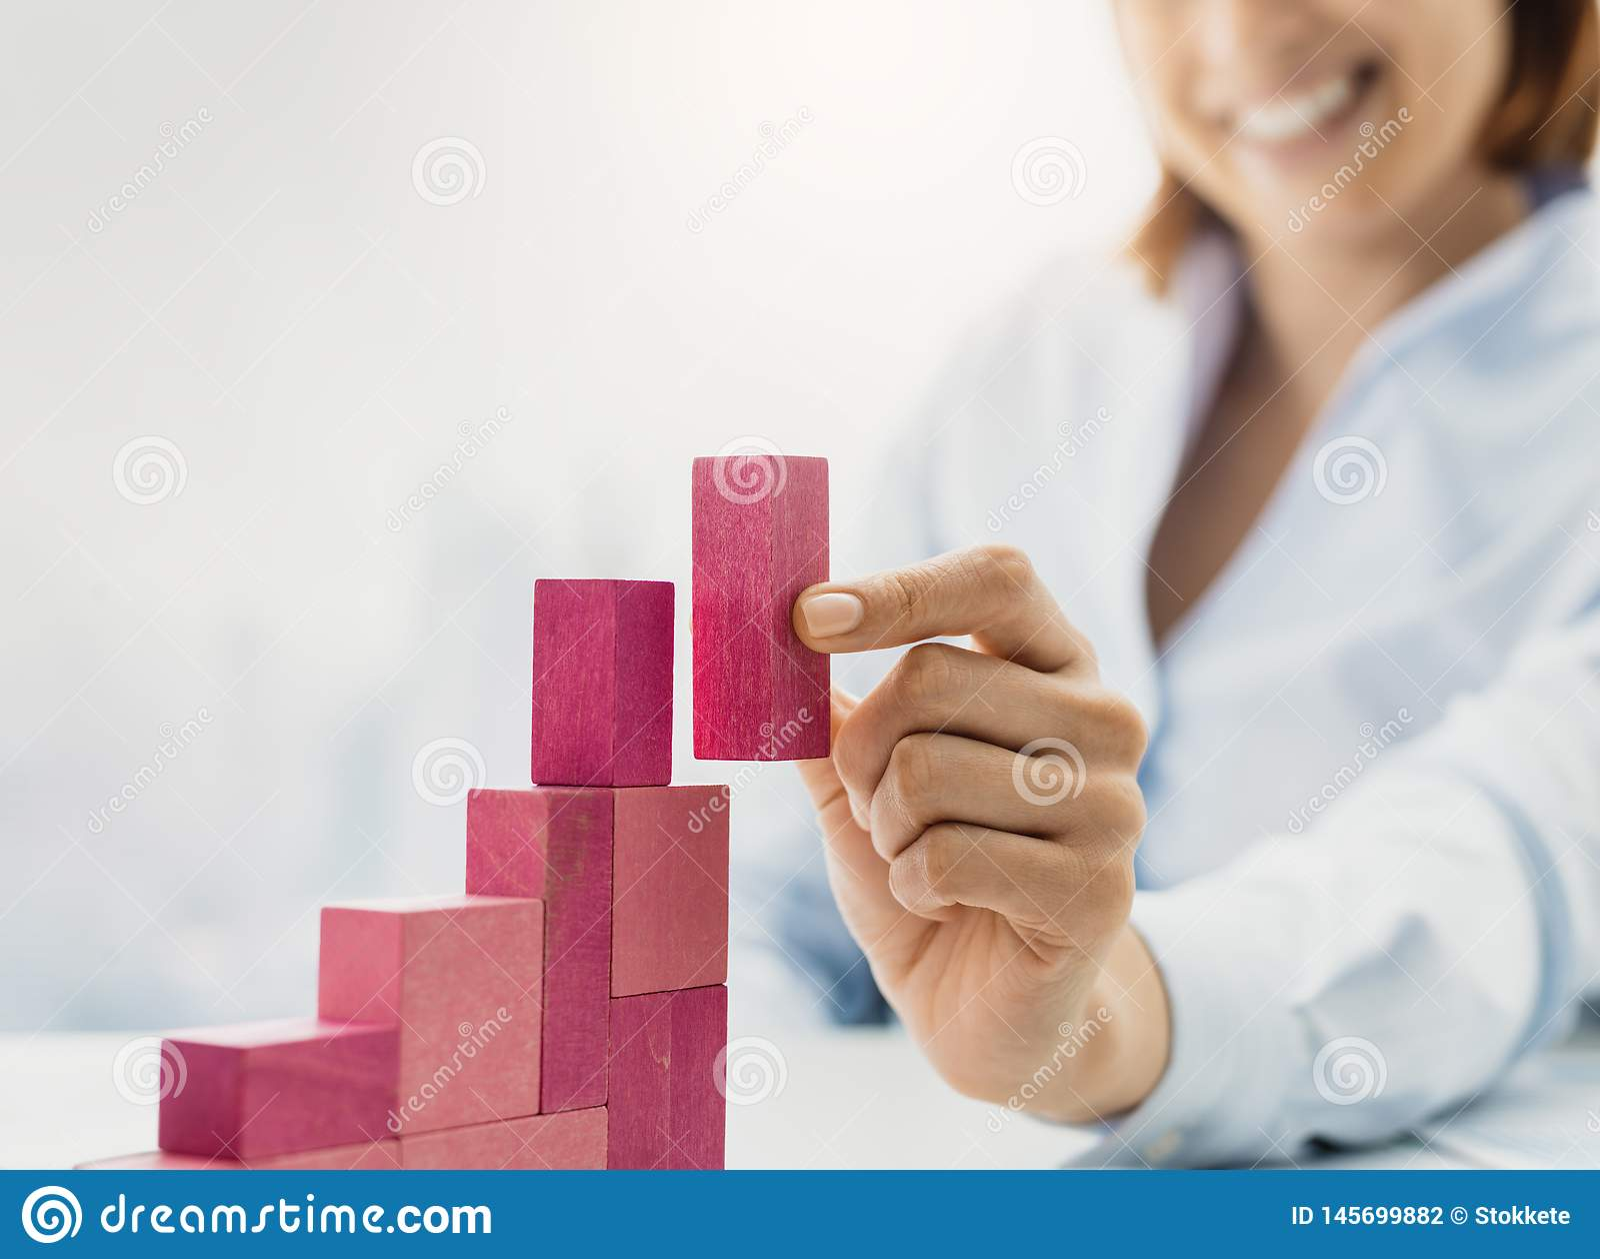 Glimlachende onderneemster die een succesvolle financi?le grafiek bouwen